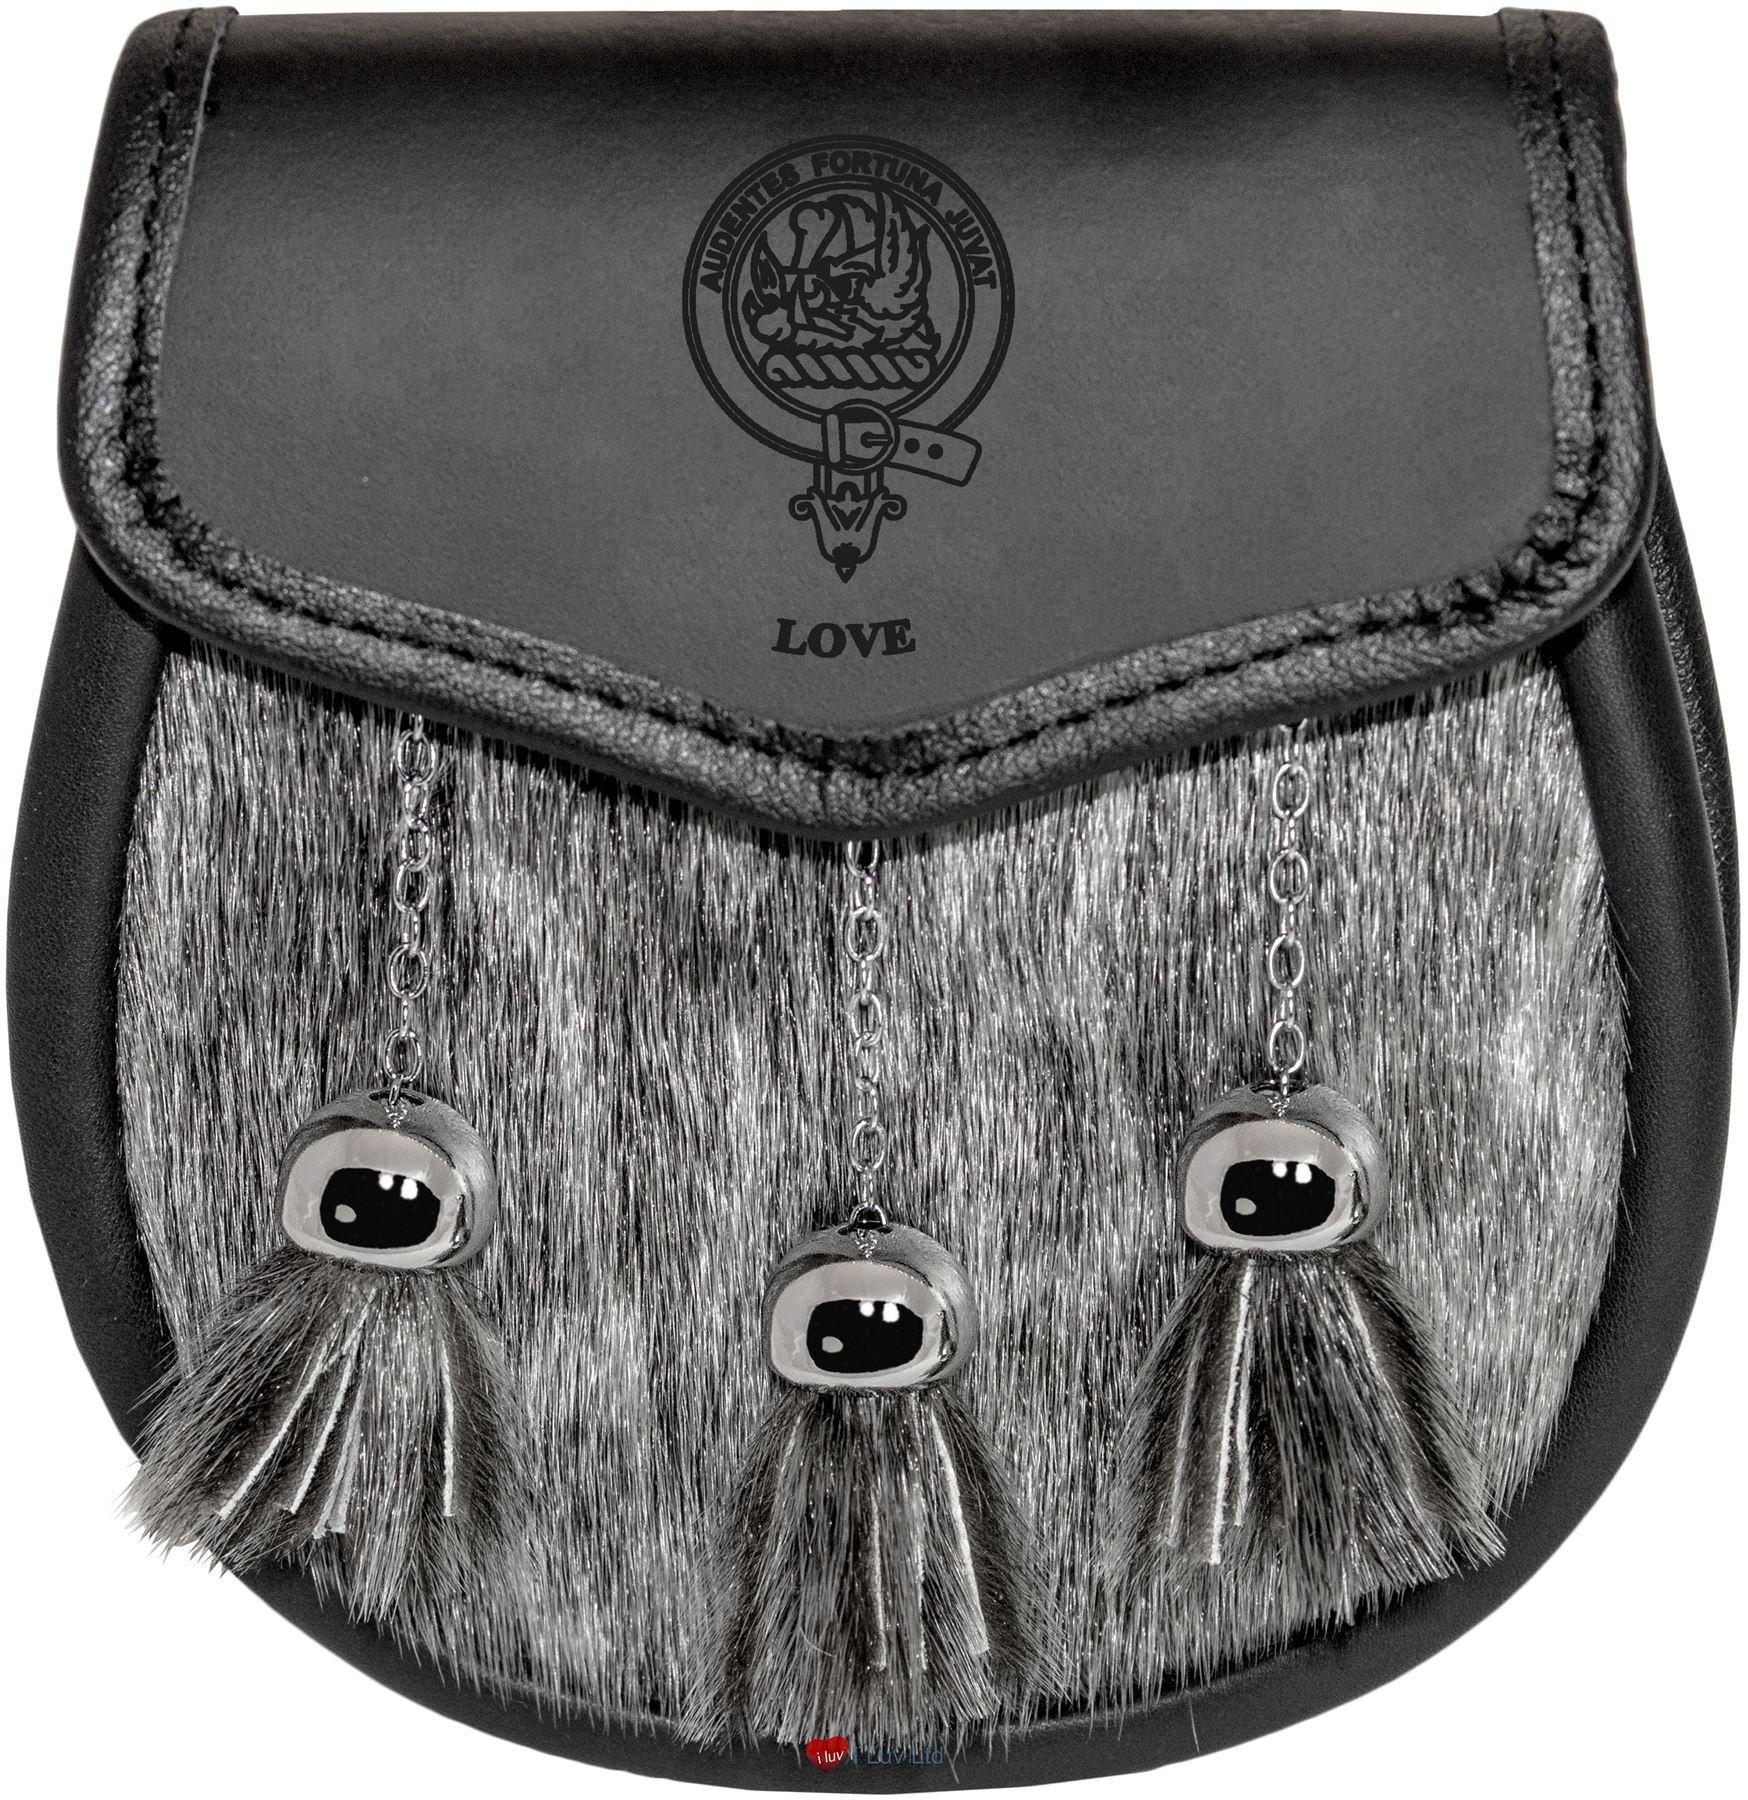 Love Semi Dress Sporran Fur Plain Leather Flap Scottish Clan Crest